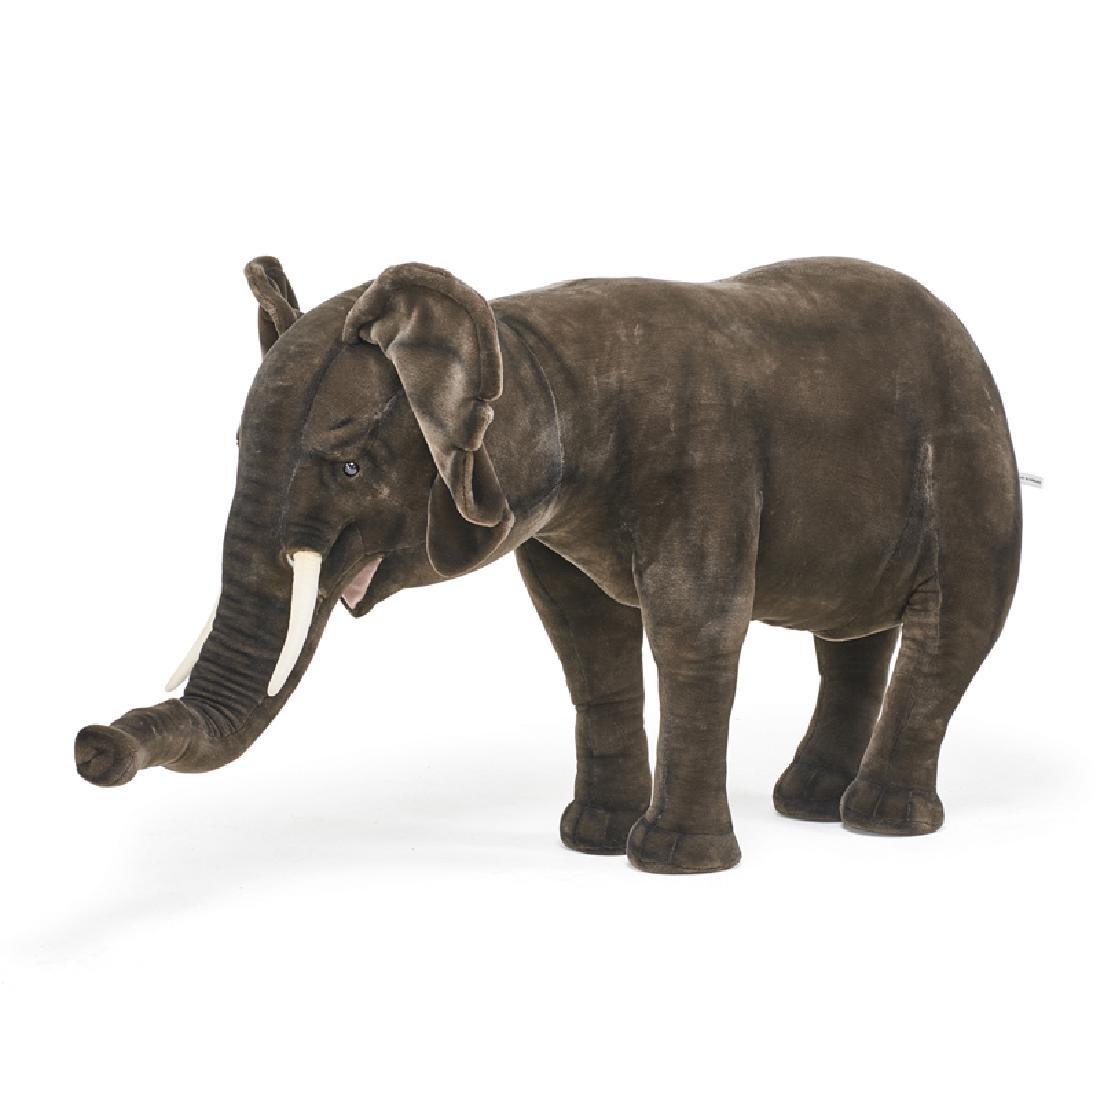 IMMENSE FAO SCHWARZ PLUSH ELEPHANT